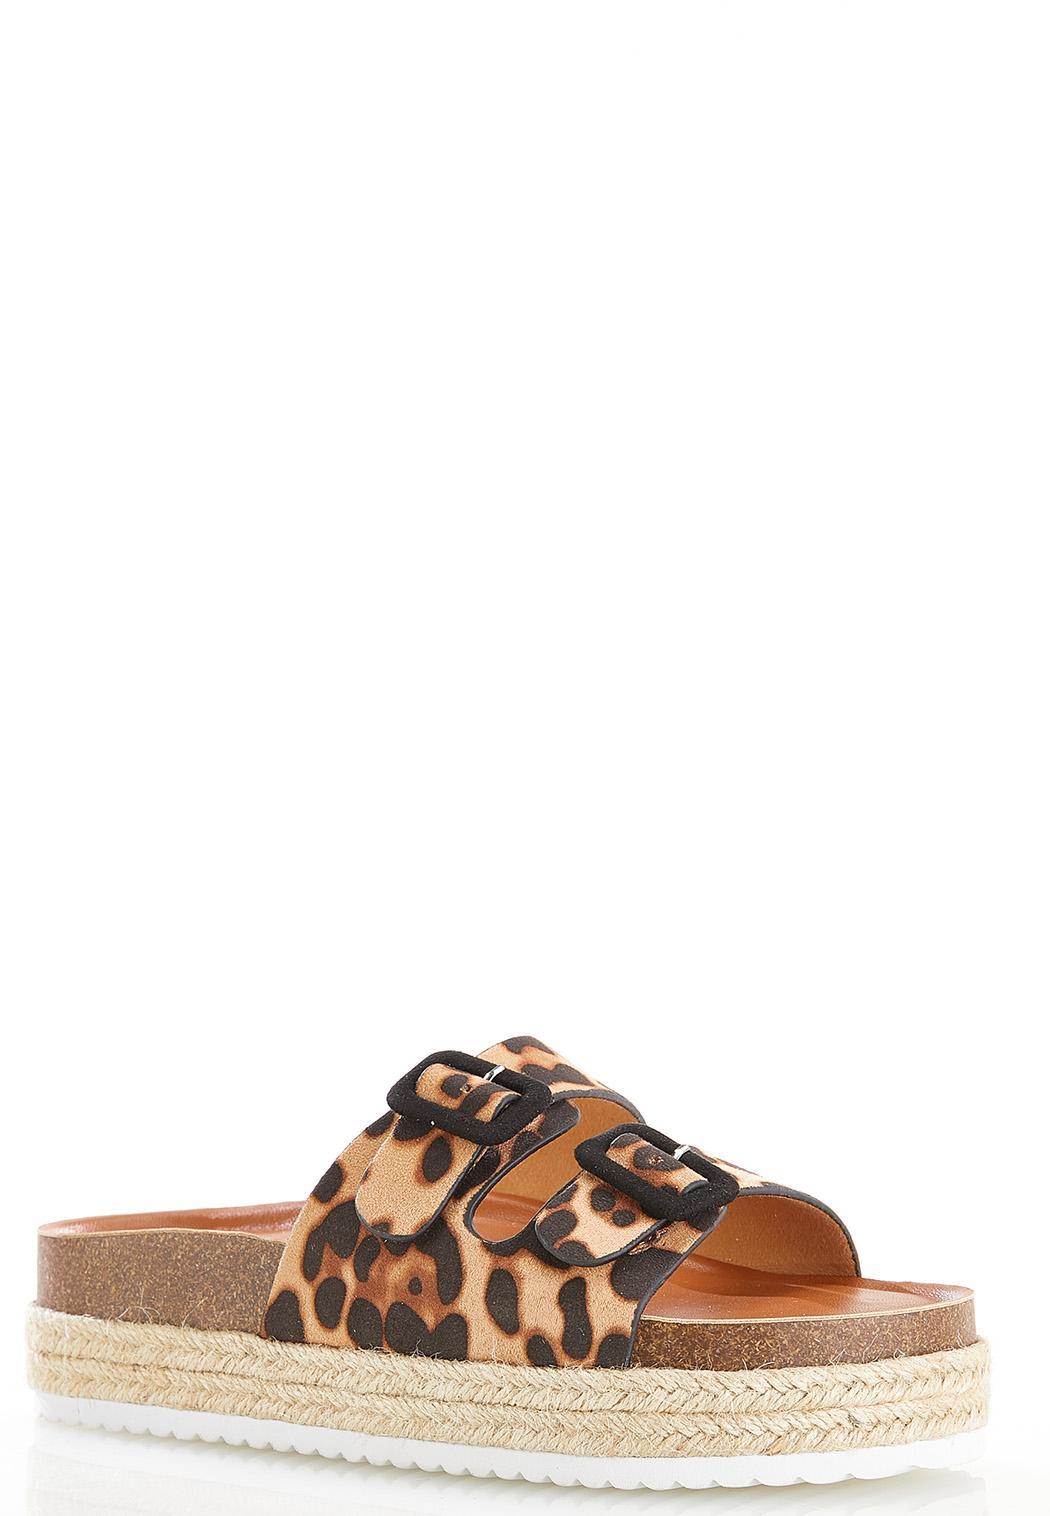 Leopard Buckle Flatform Sandals